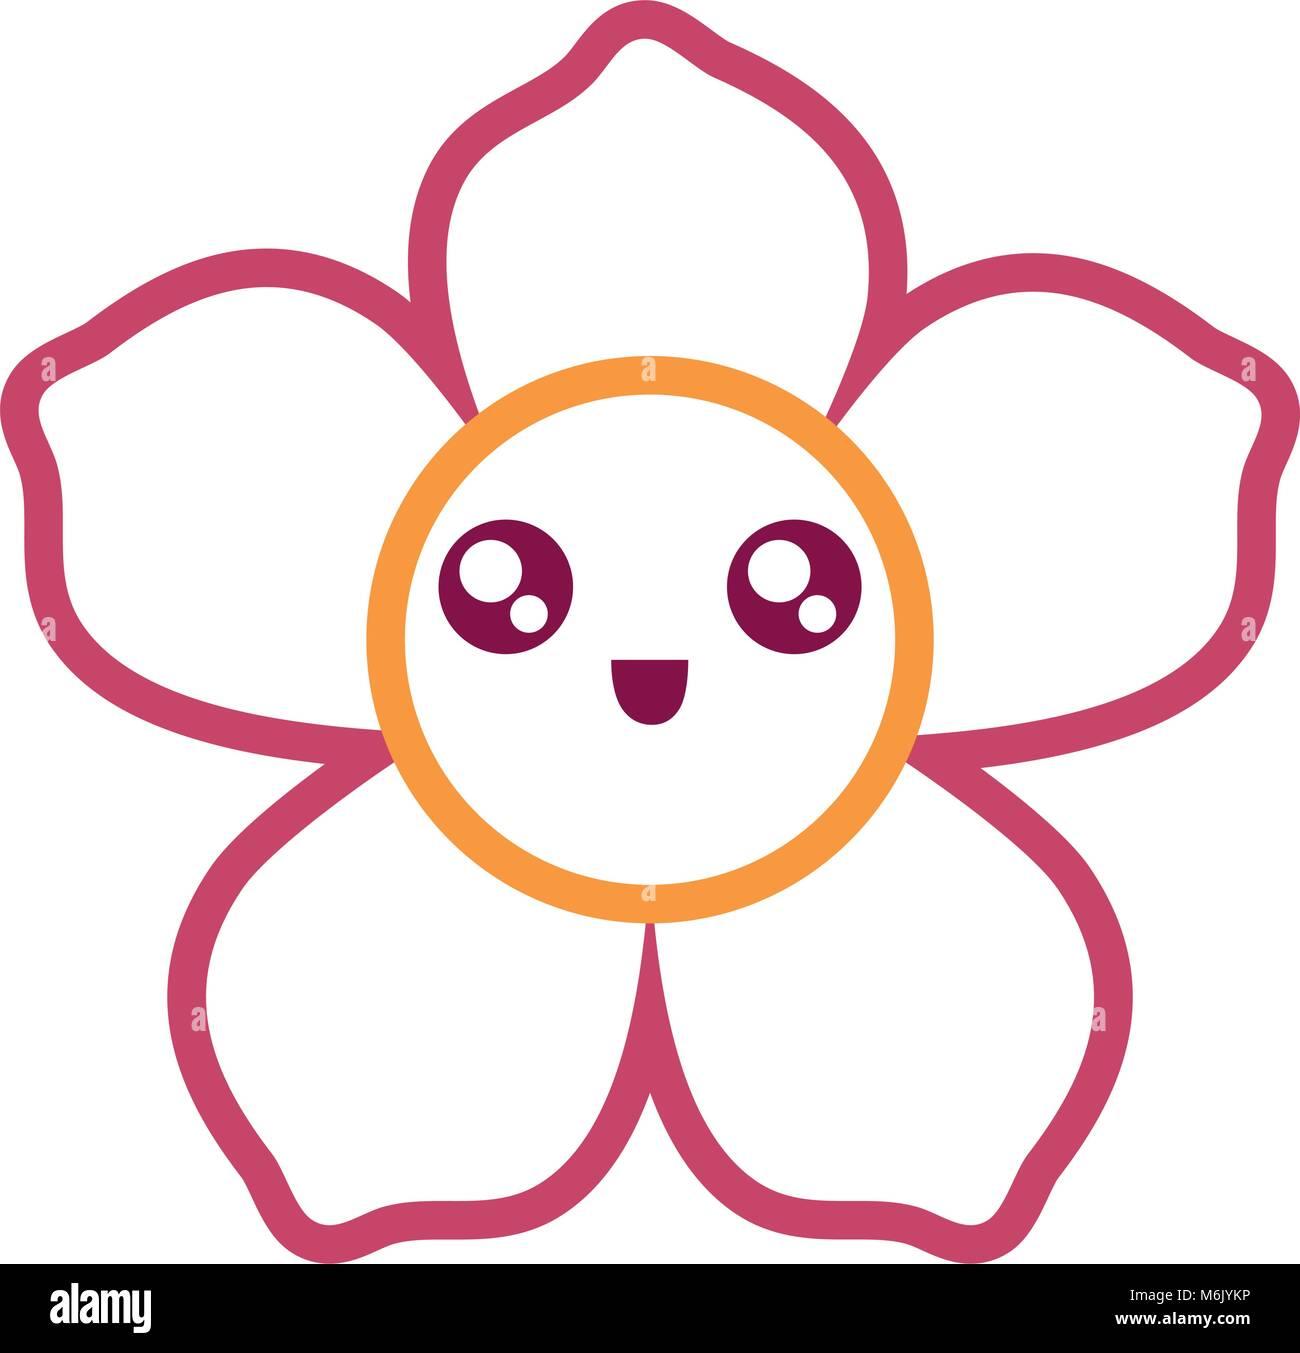 Cartoon Of Garden Flowers Stock Photos & Cartoon Of Garden